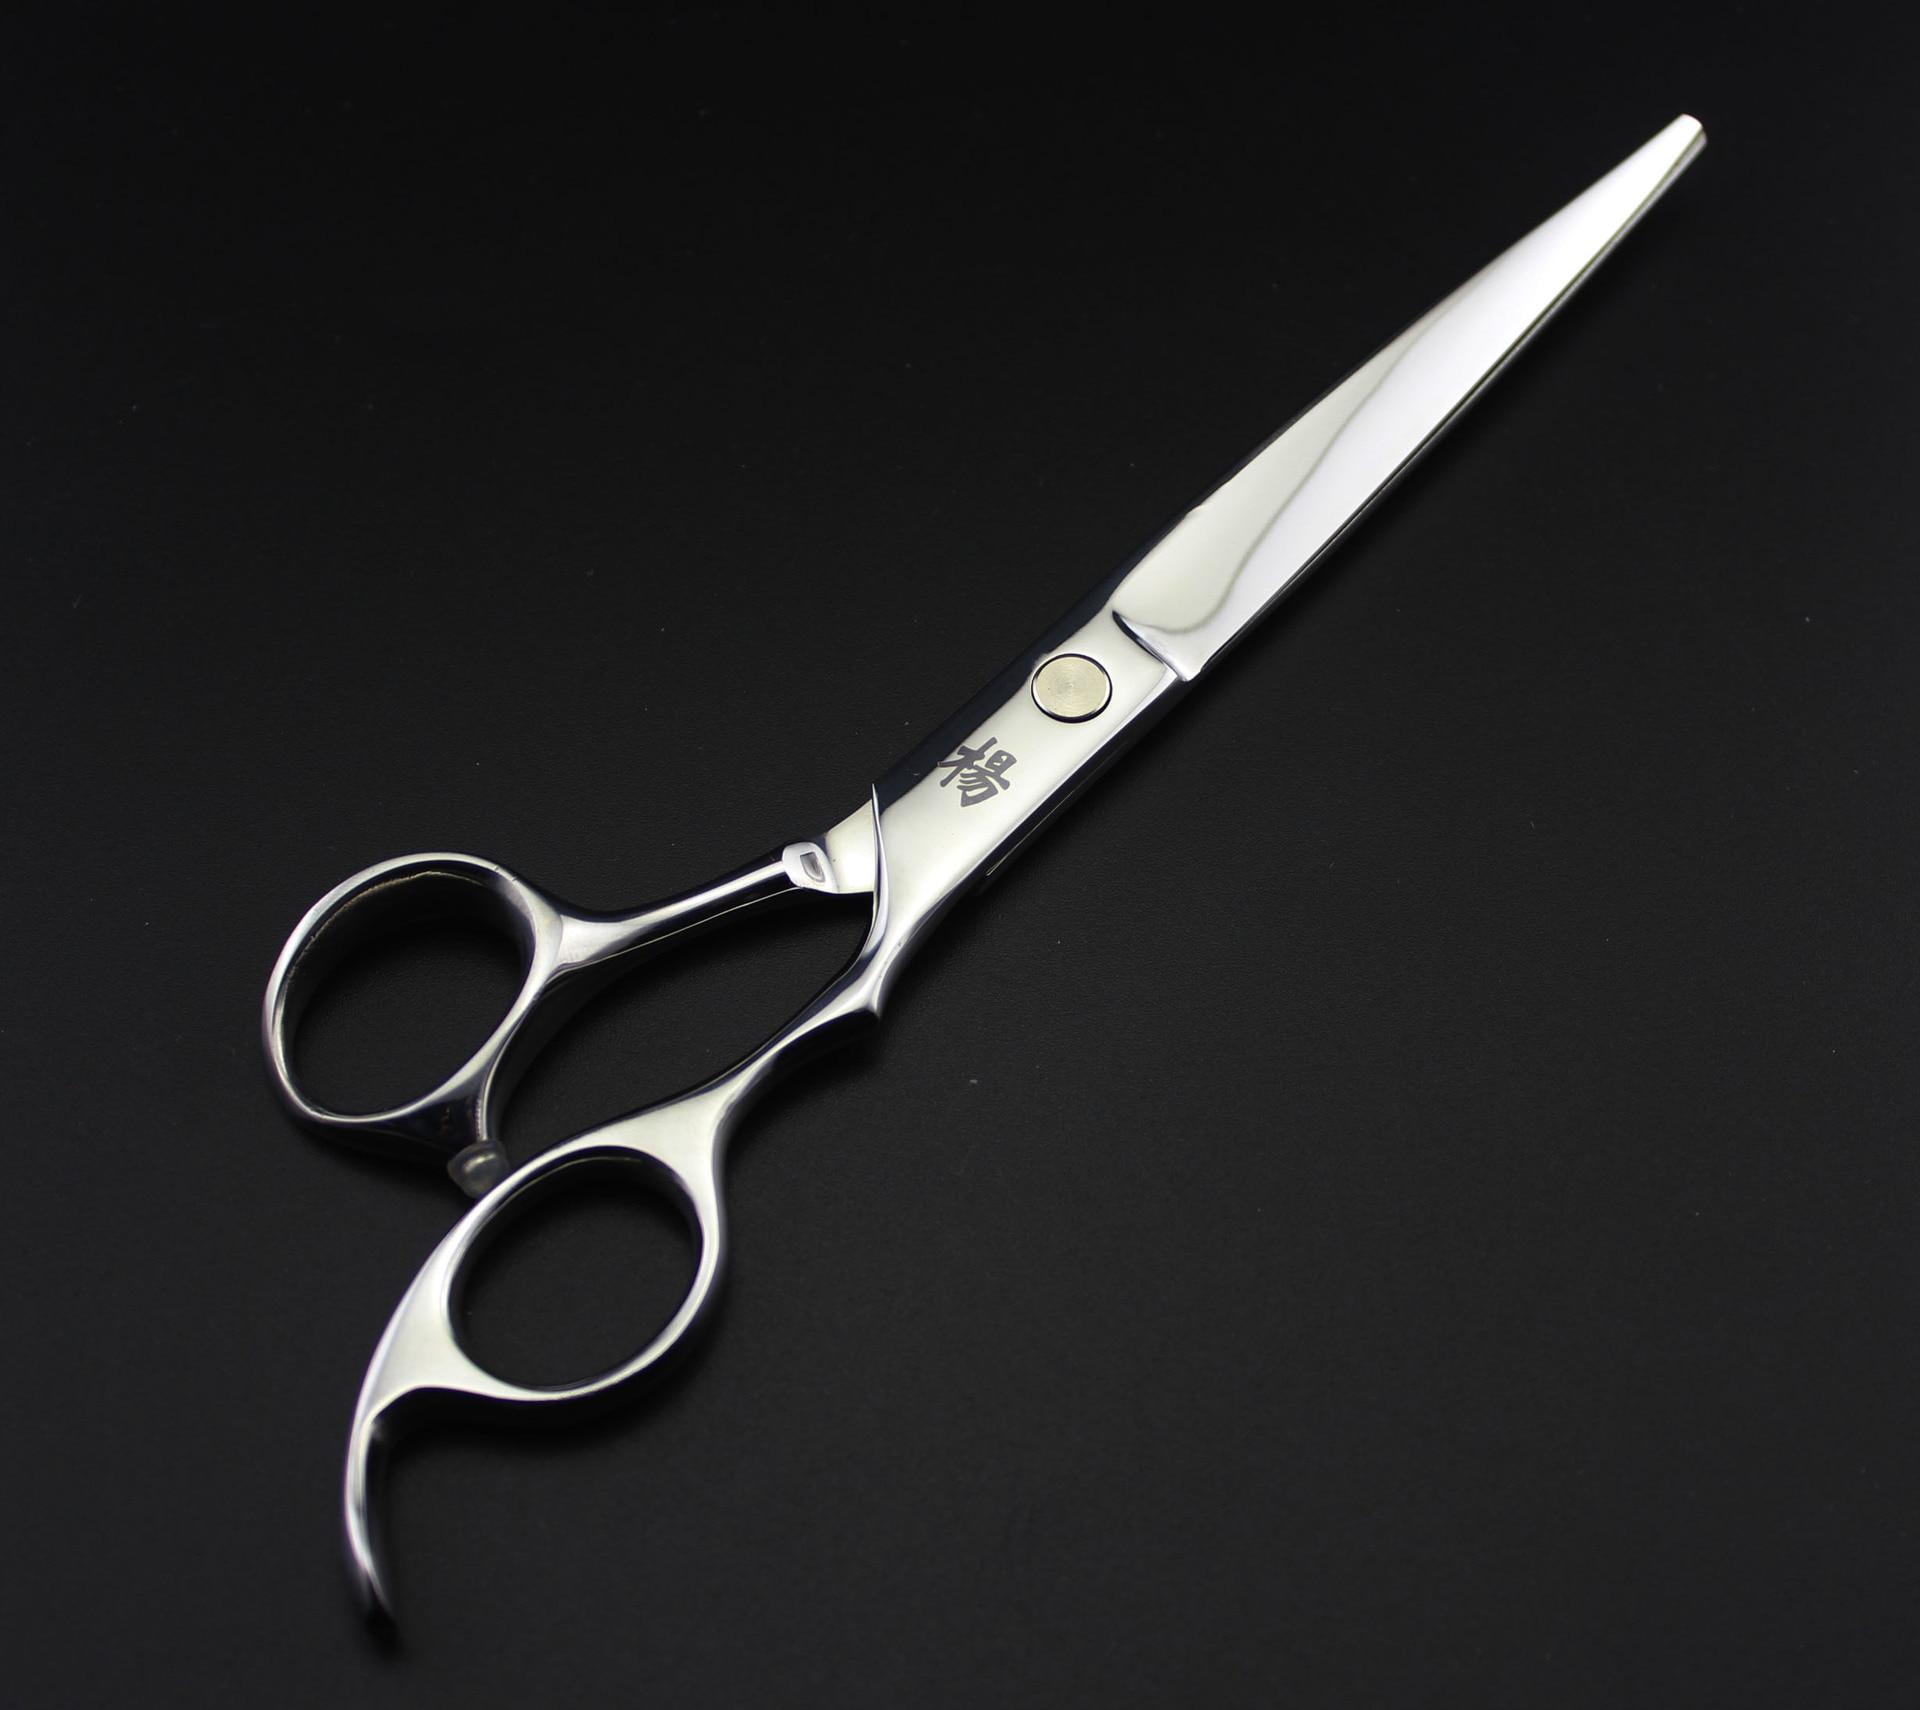 7.0-Inch Yang Cut Hand Pet Scissors Beauty Scissor Straight Scissors Thinning Shear